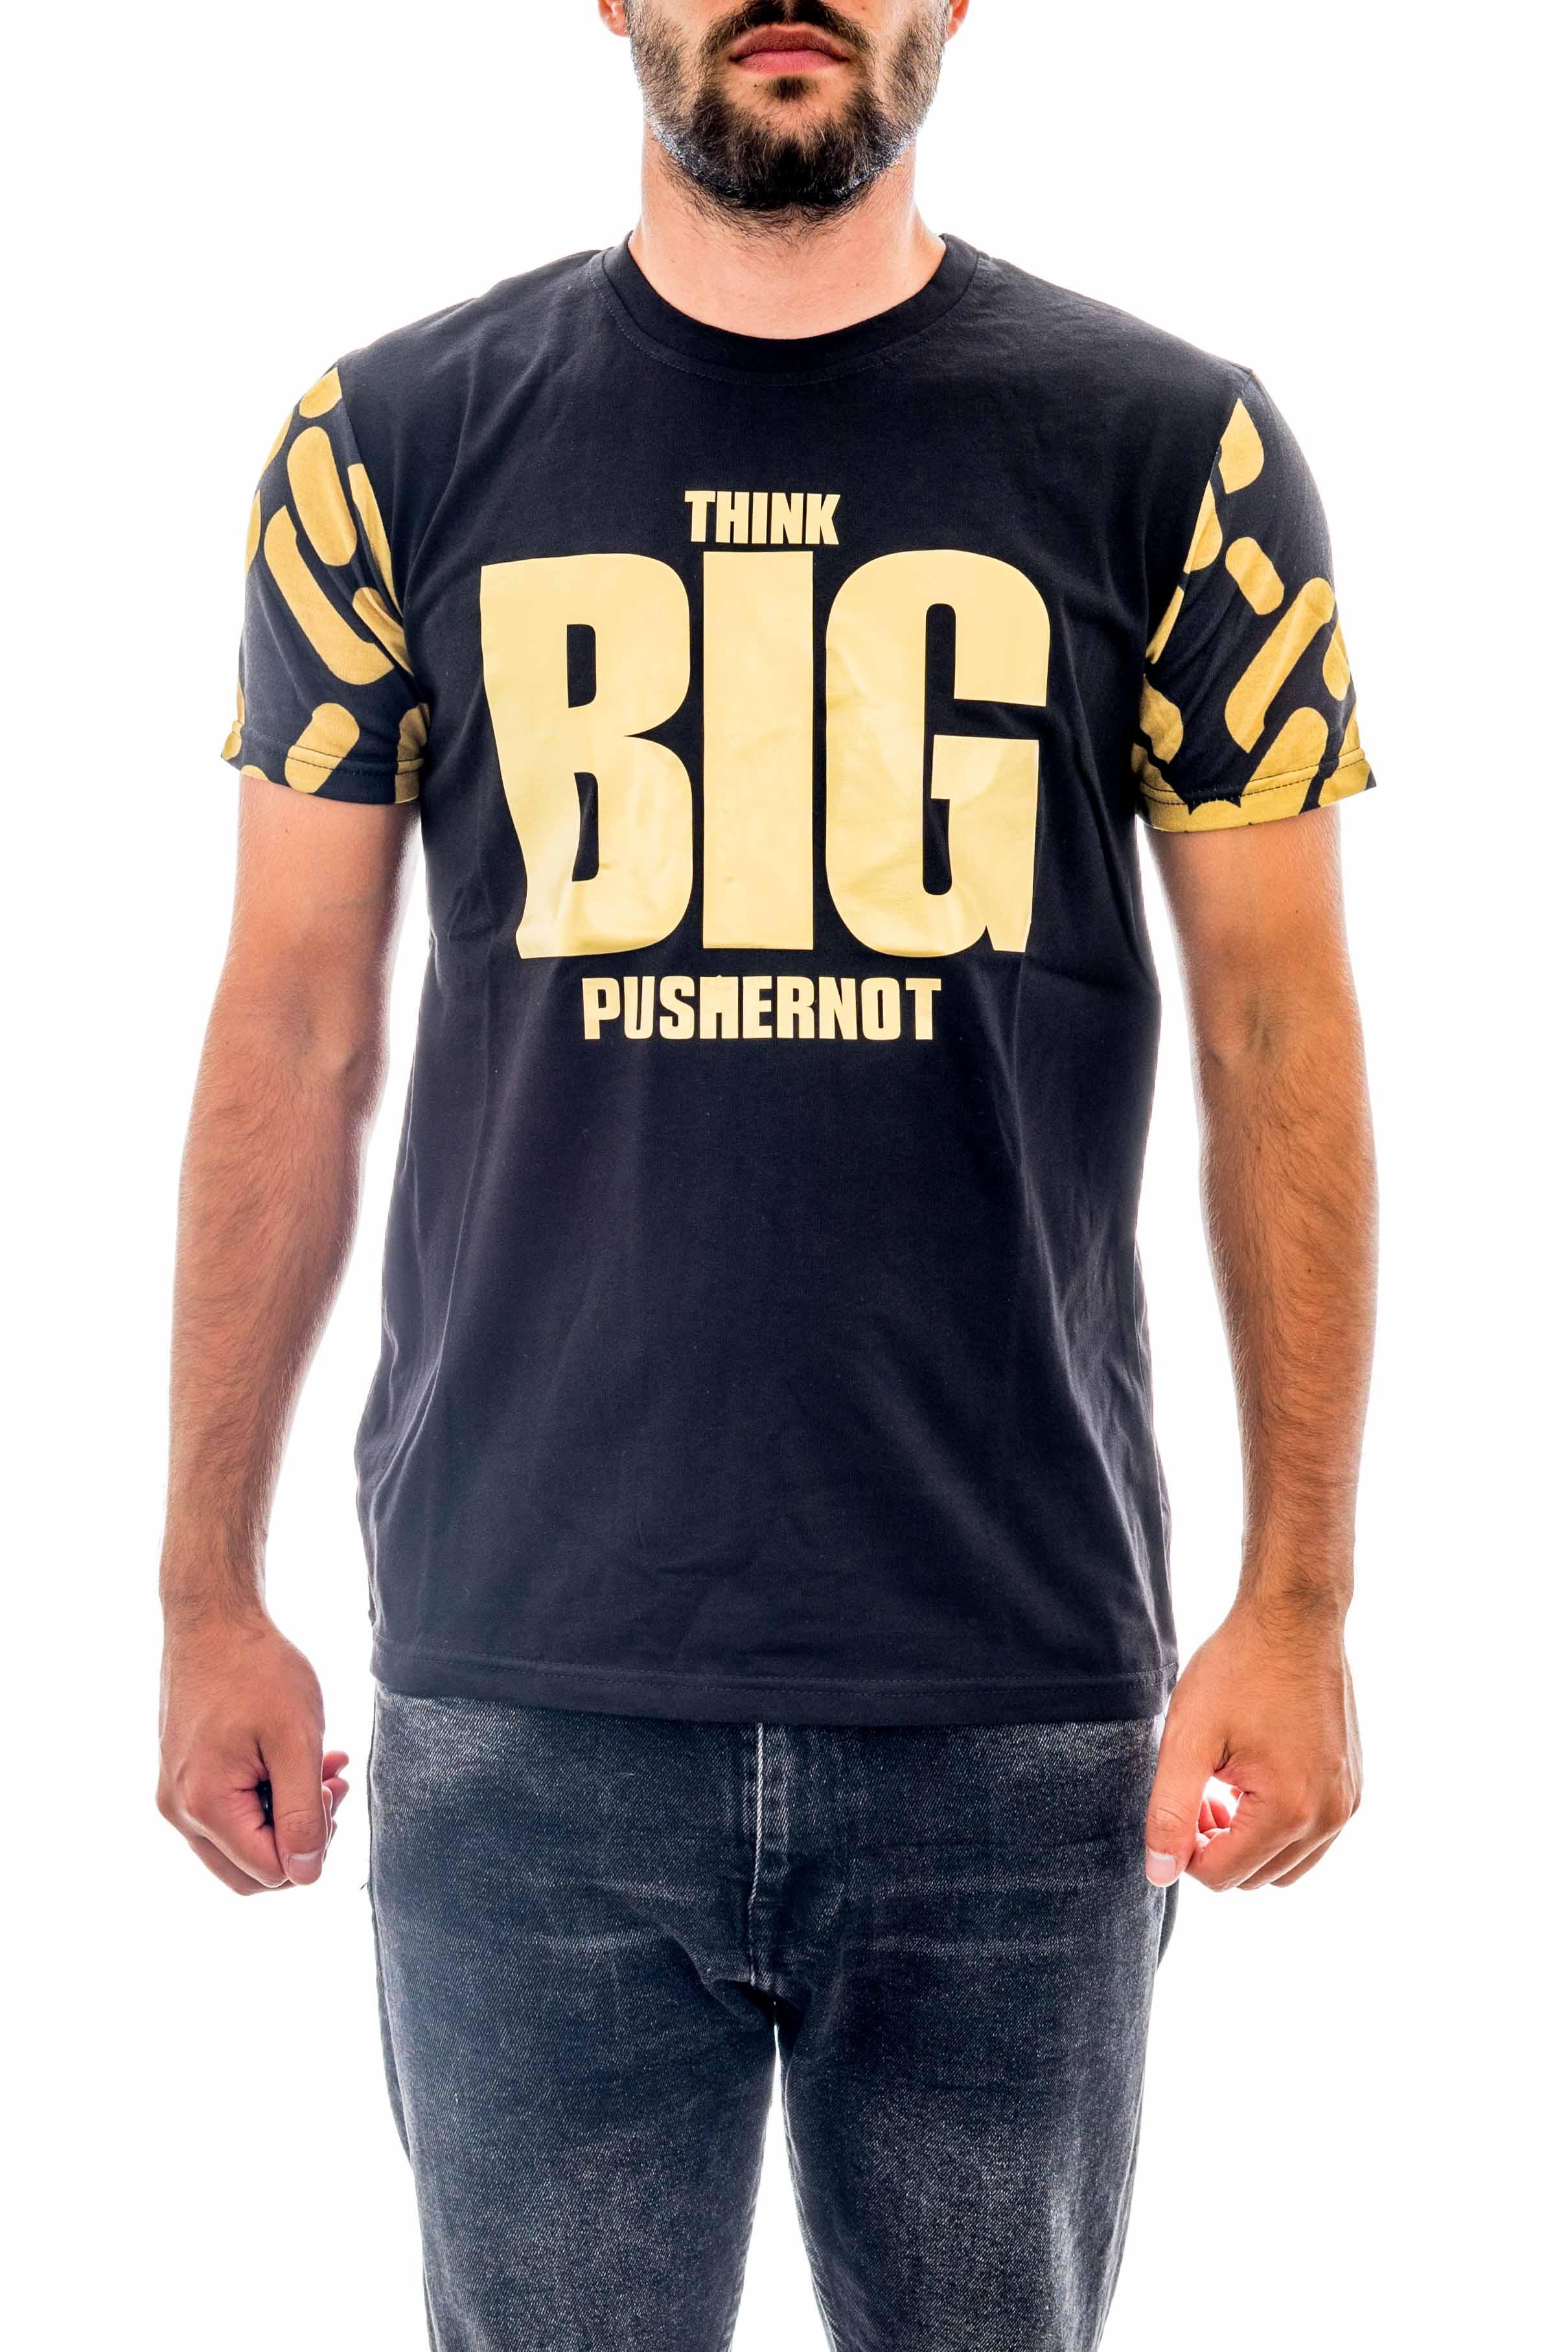 T-shirt PUSHERNOT | T-shirt | PUBIG08BLACK